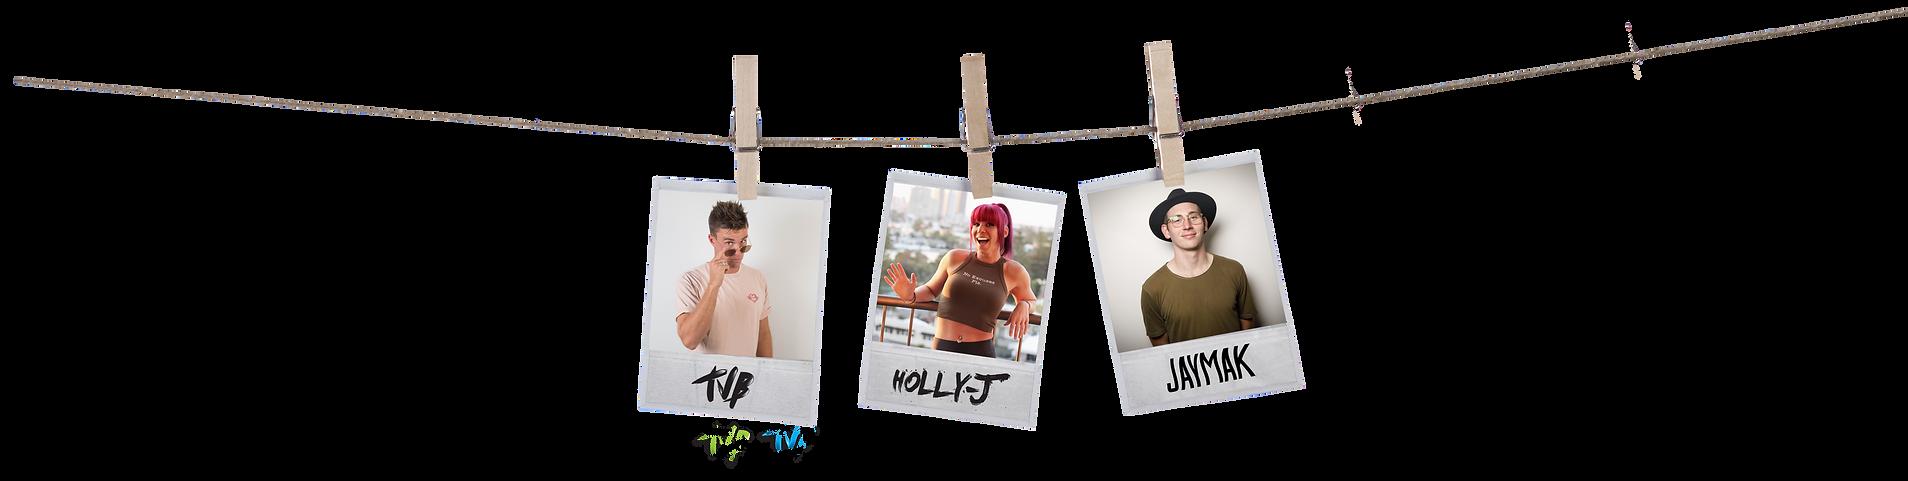 Crewless - Polaroid - May 2019 Longer Ro